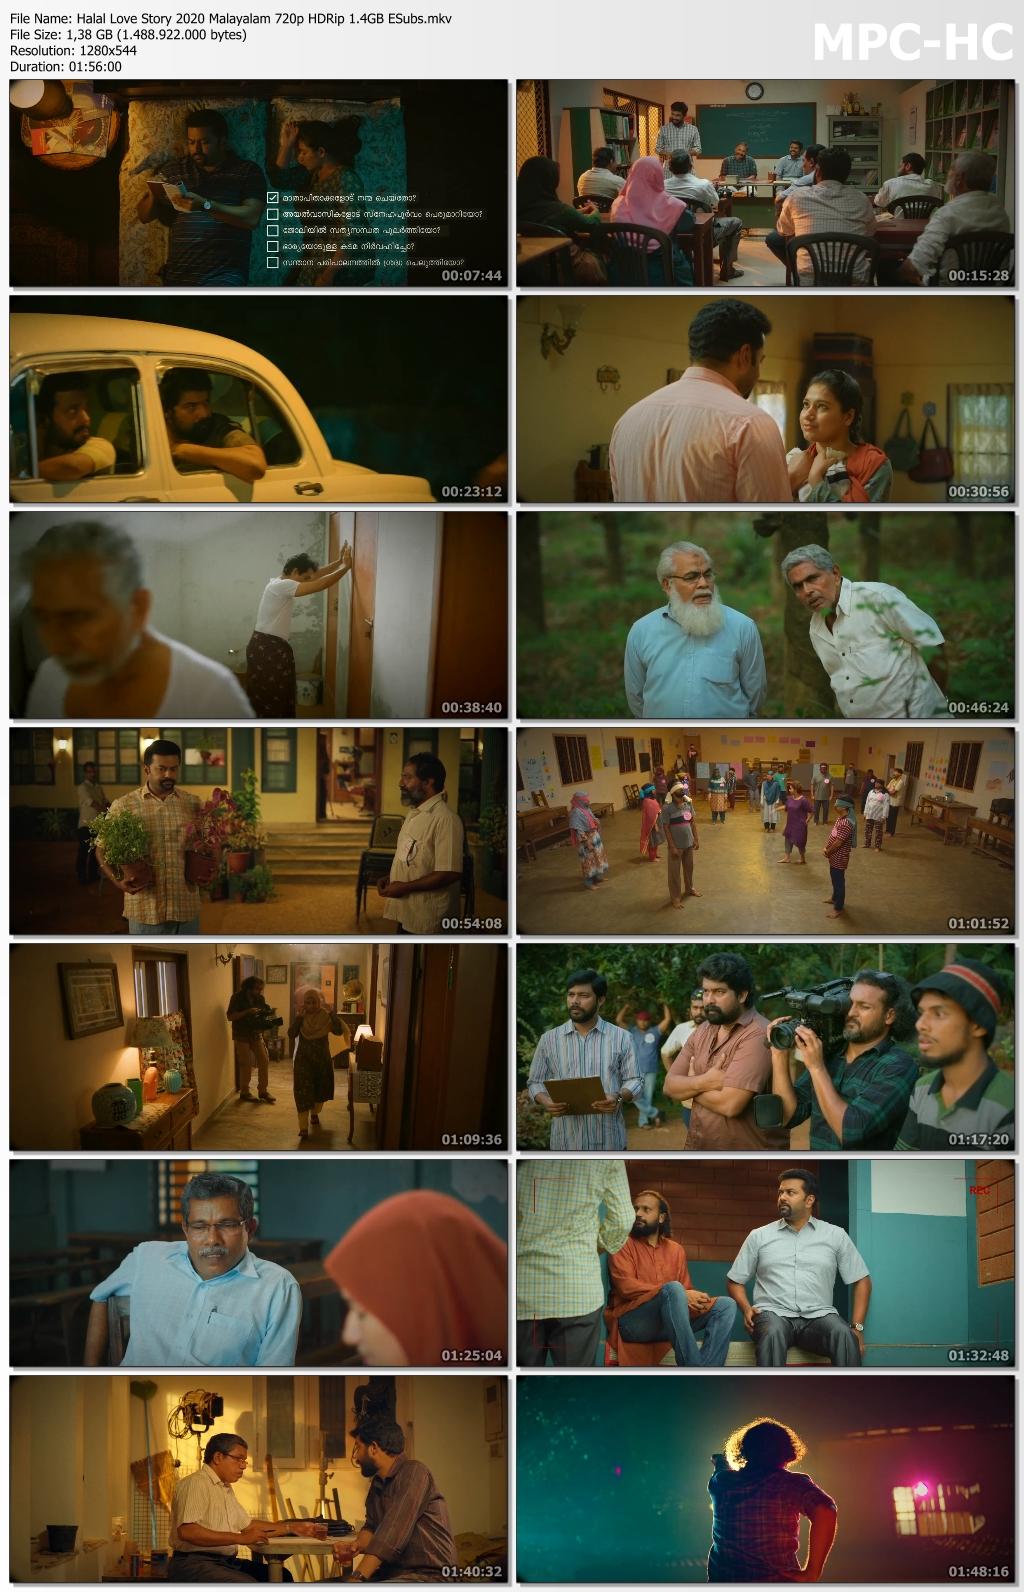 Halal-Love-Story-2020-Malayalam-720p-HDRip-1-4-GB-ESubs-mkv-thumbs